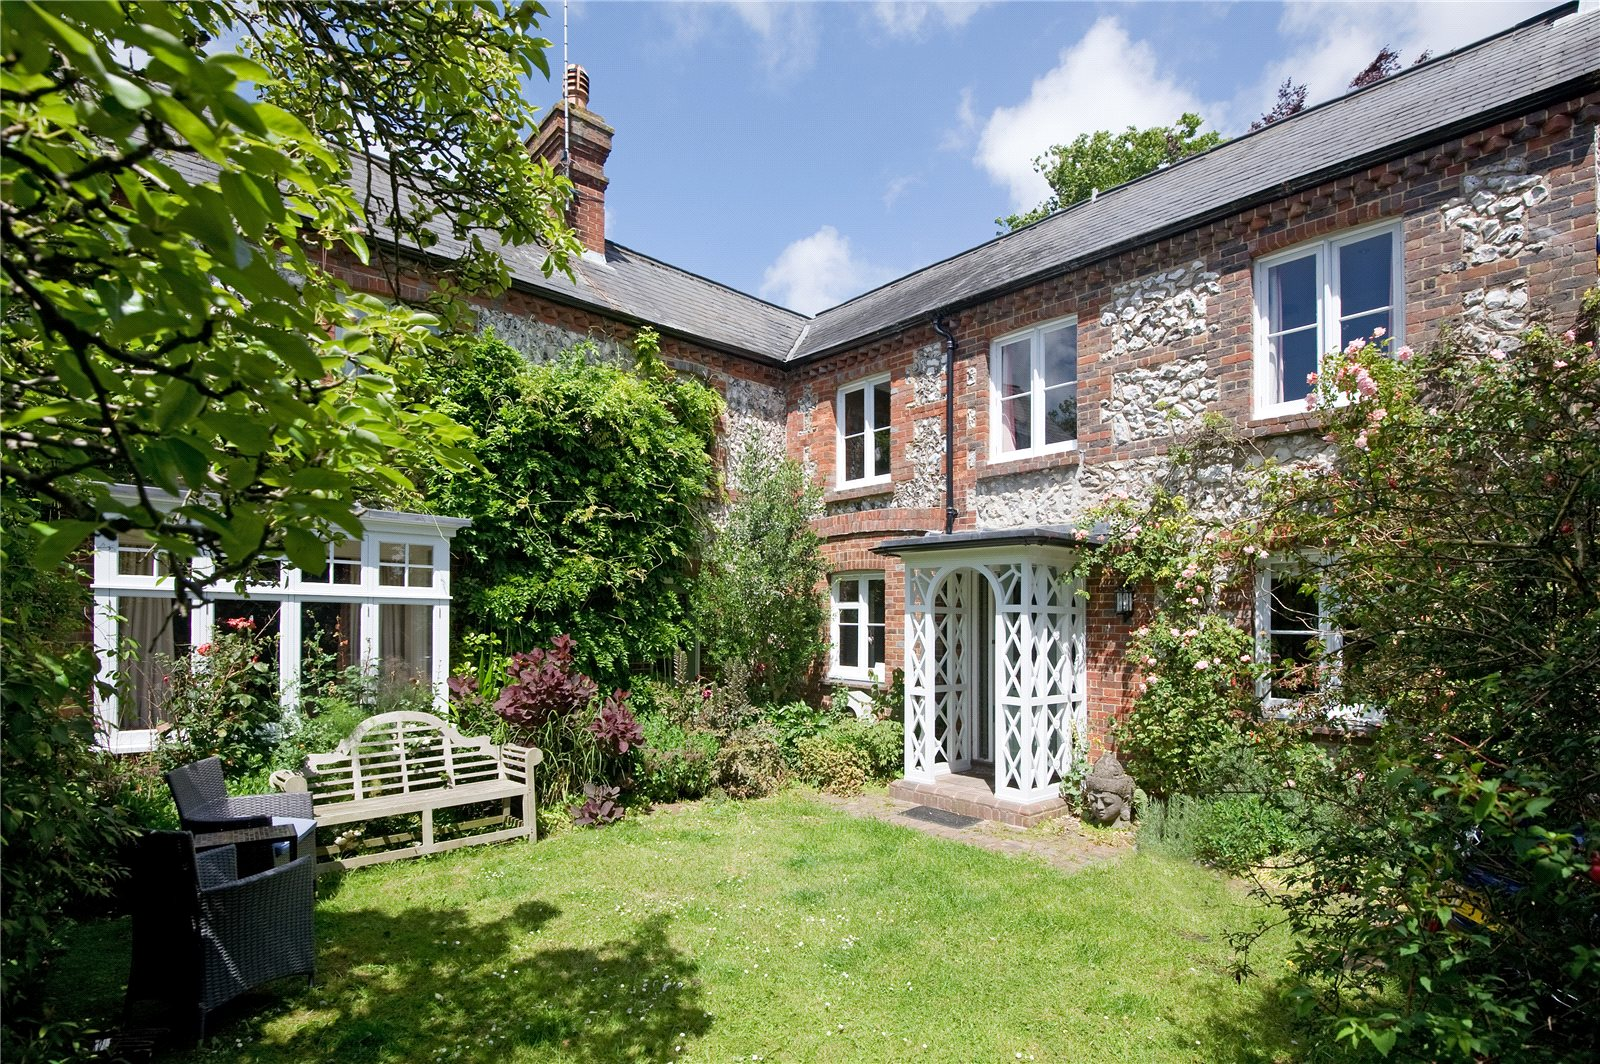 Частный дом для того Продажа на Castle Precincts, Lewes, East Sussex, BN7 Lewes, Англия